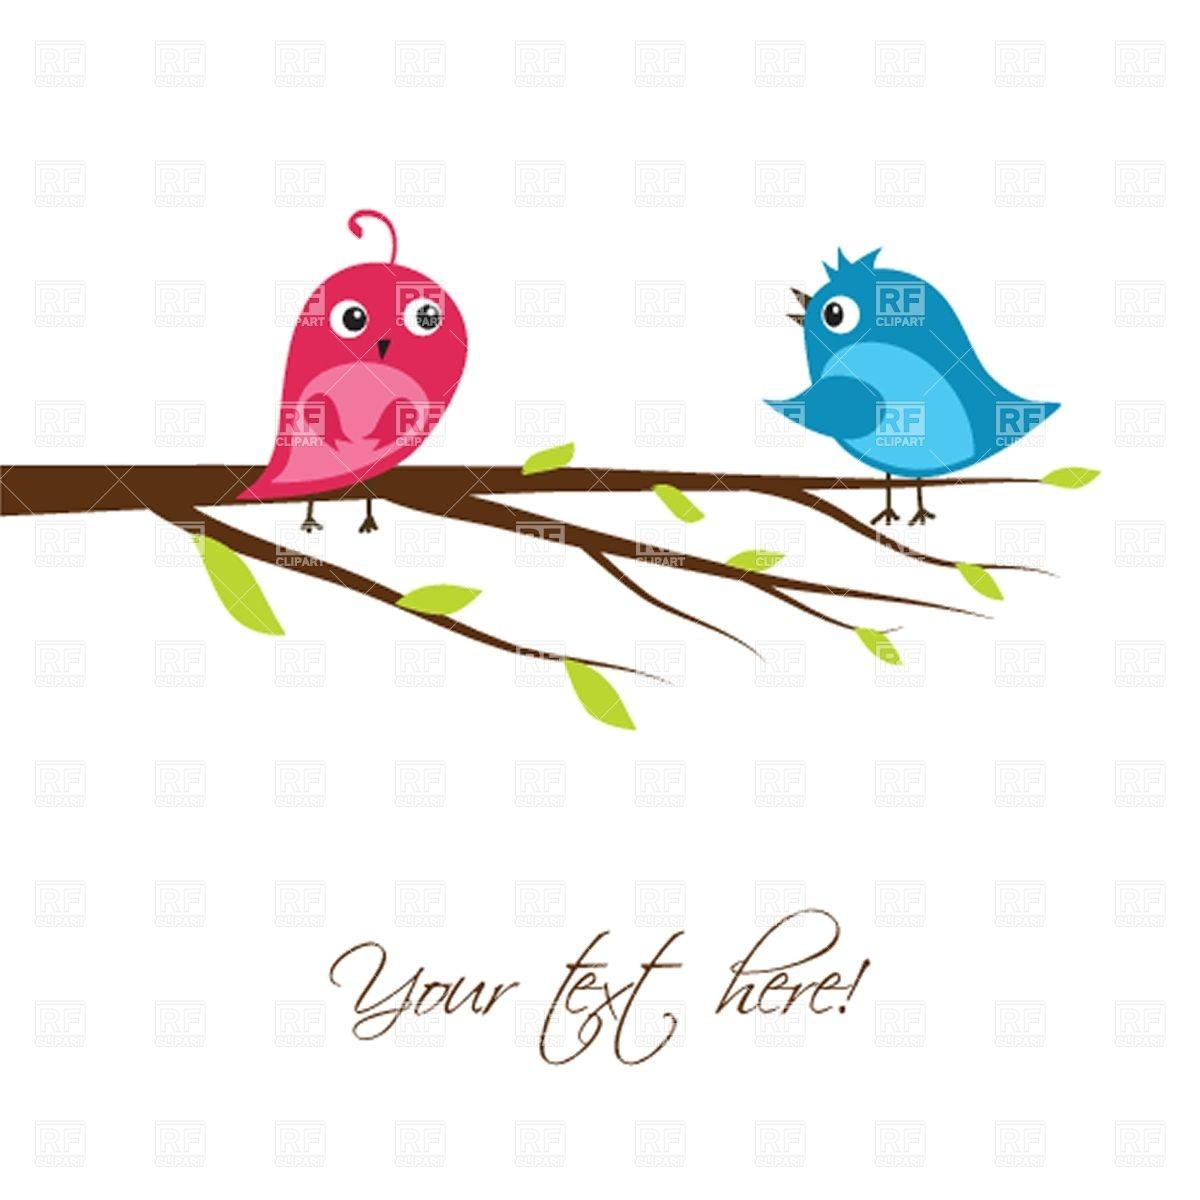 Fall Bird Feeder Wallpaper Love Birds In Tree Clipart Clipart Panda Free Clipart